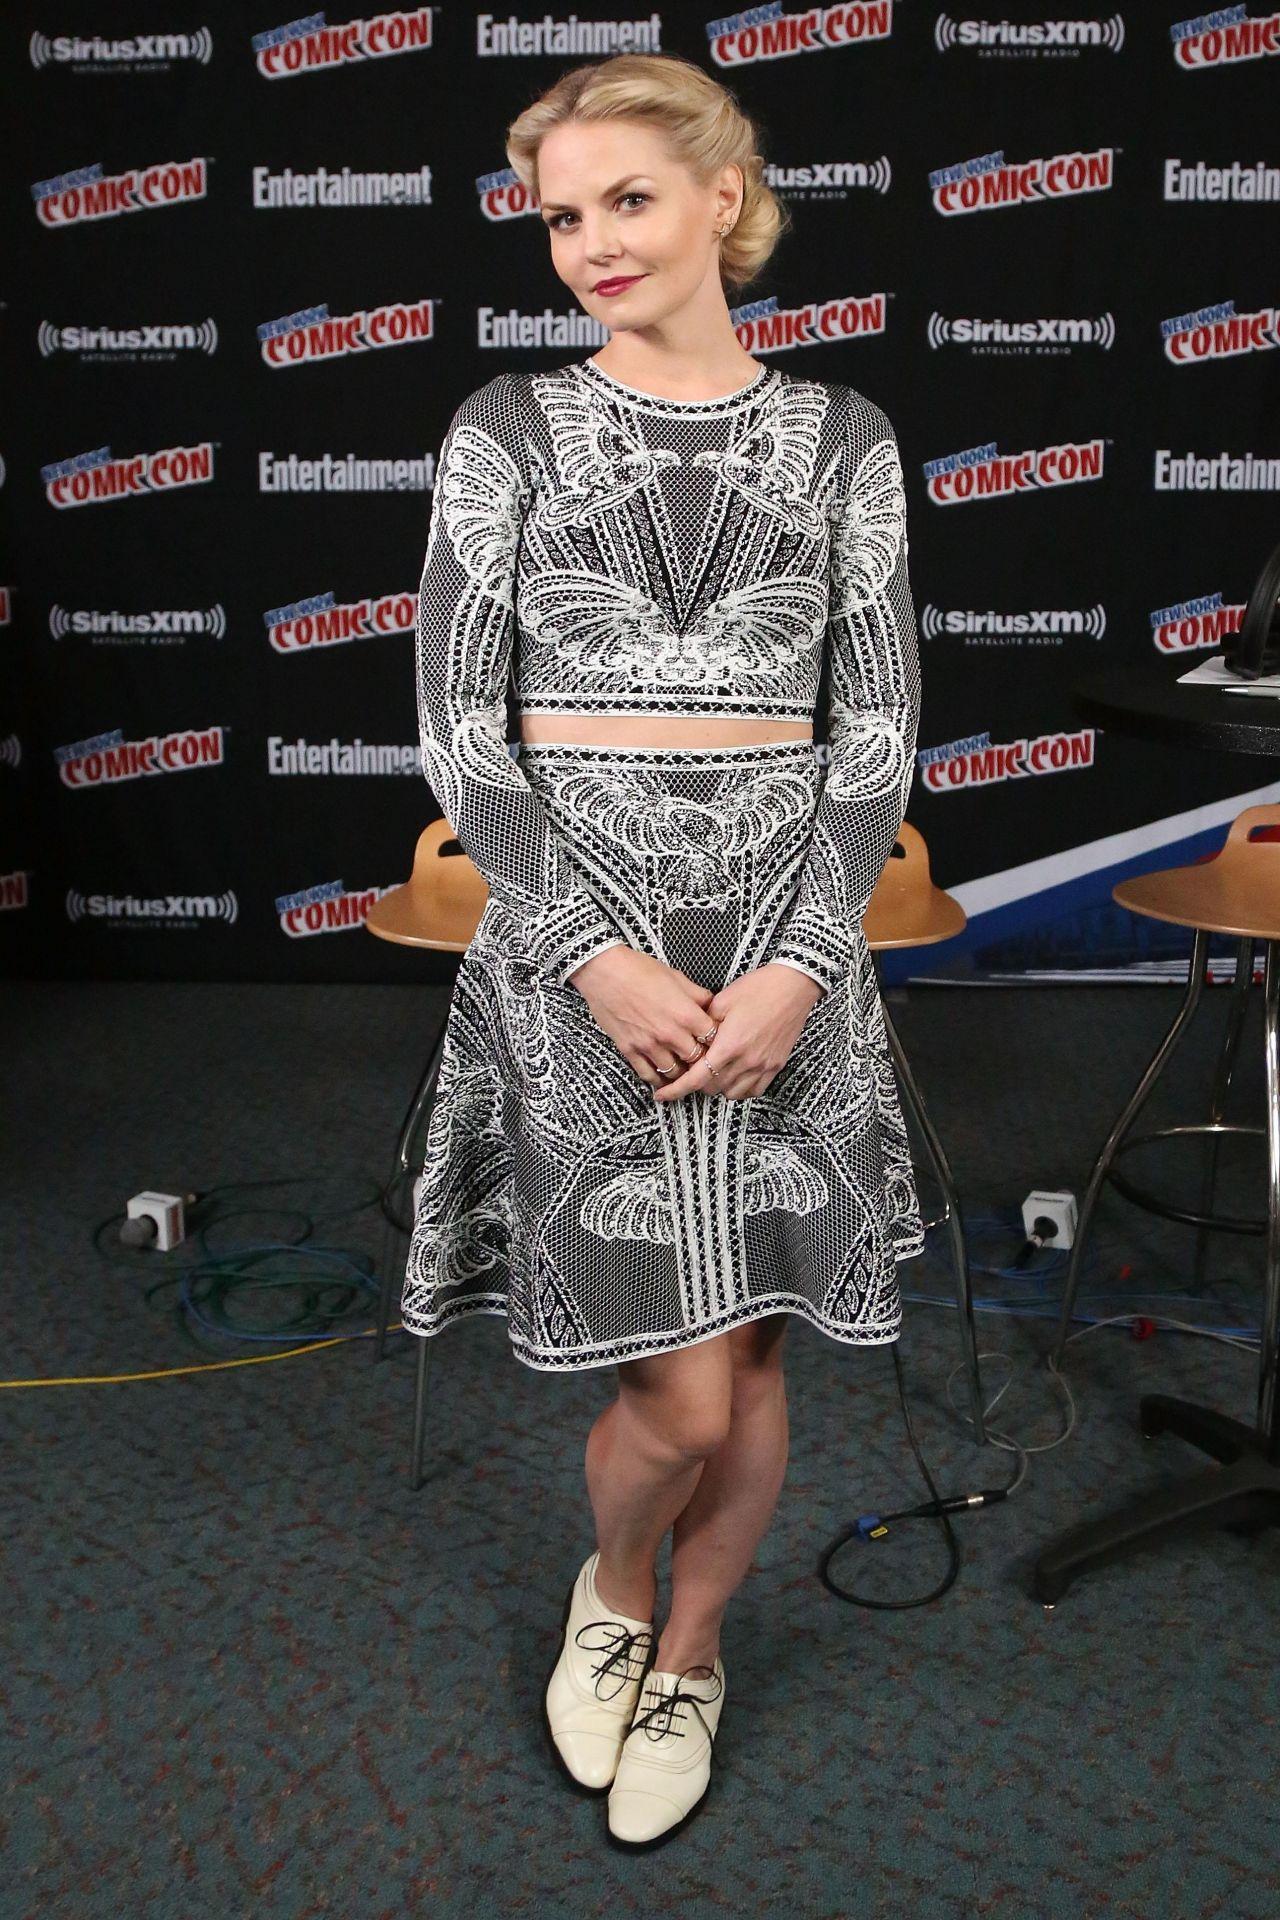 Jennifer Morrison - SiriusXM Studio at New York Comic Con, October 2015